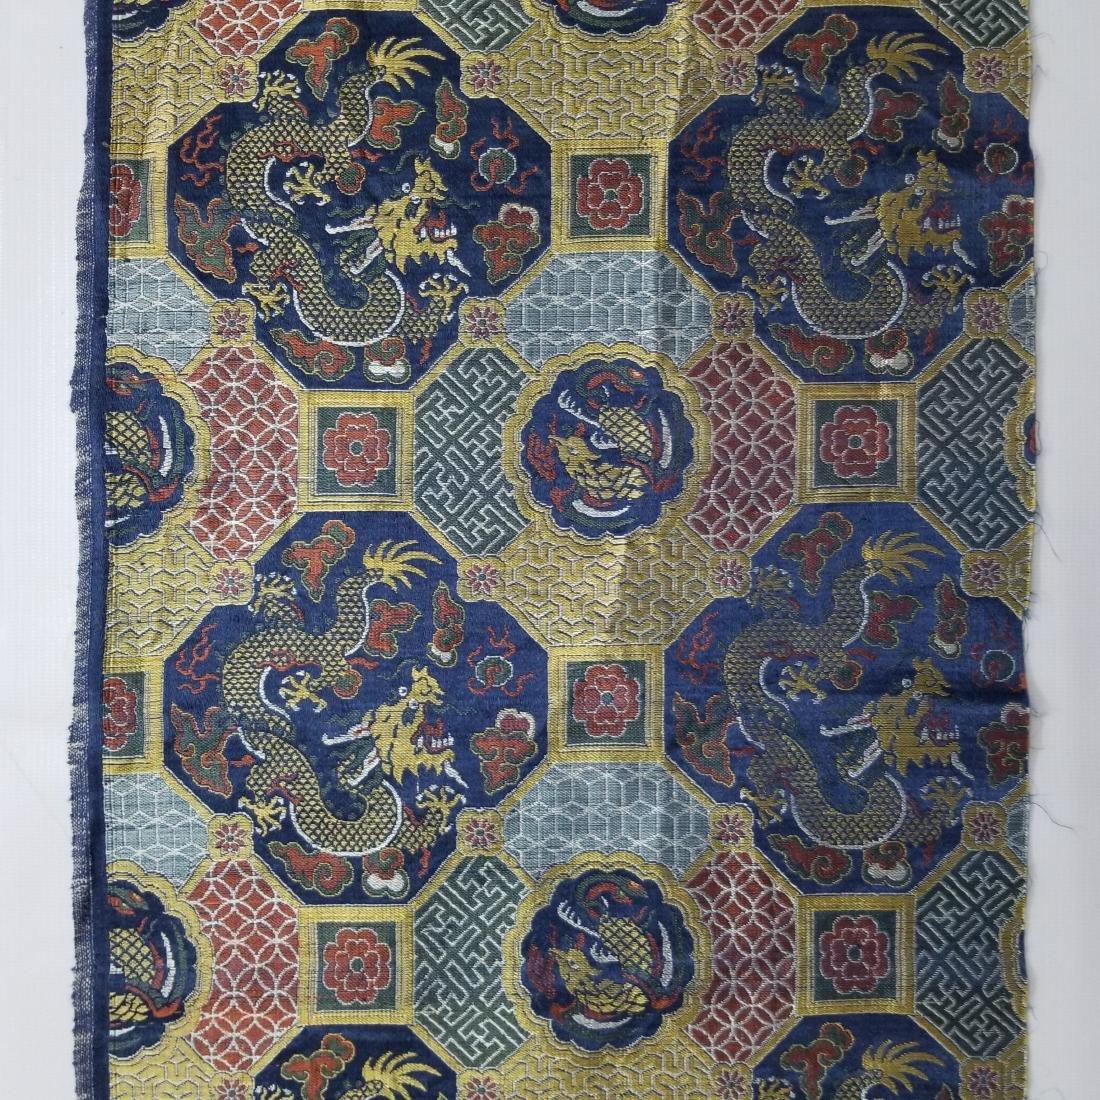 Chinese Silk Brocade Dragon Panel - 5